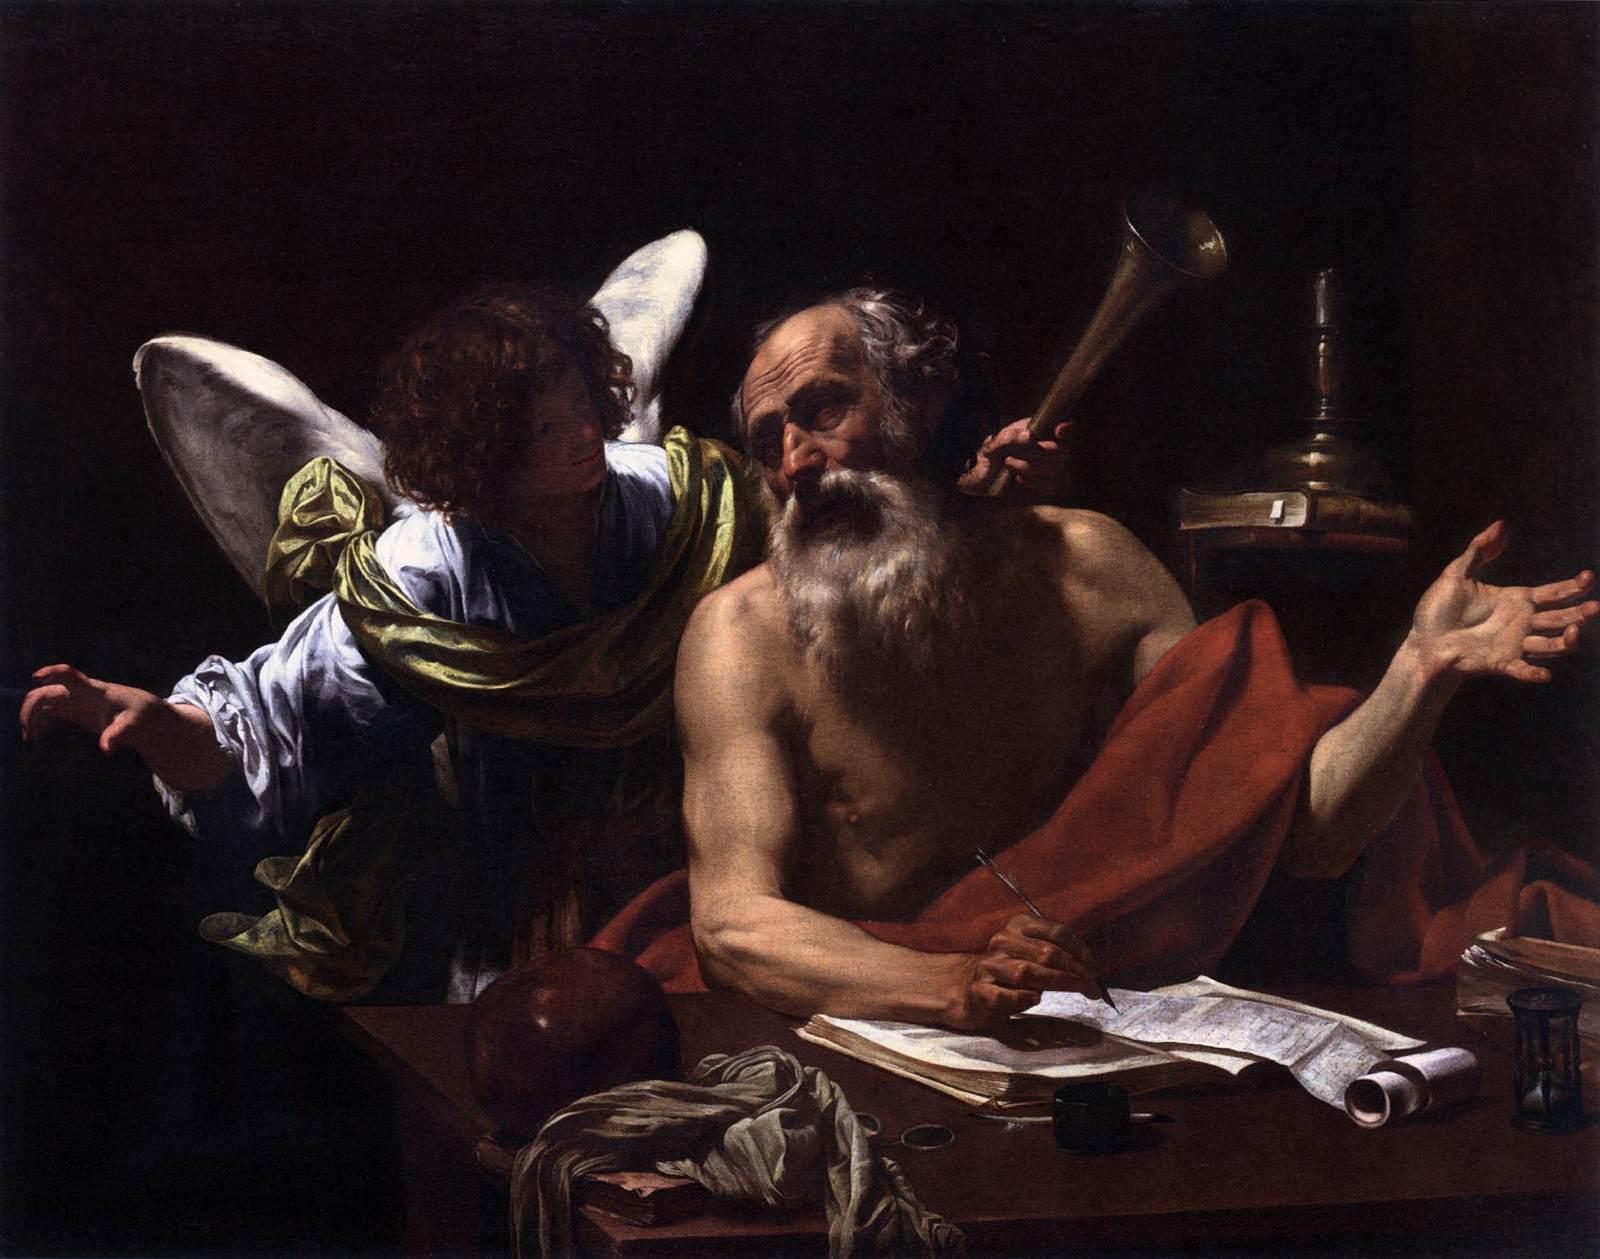 vouet-jerome-1620.jpg